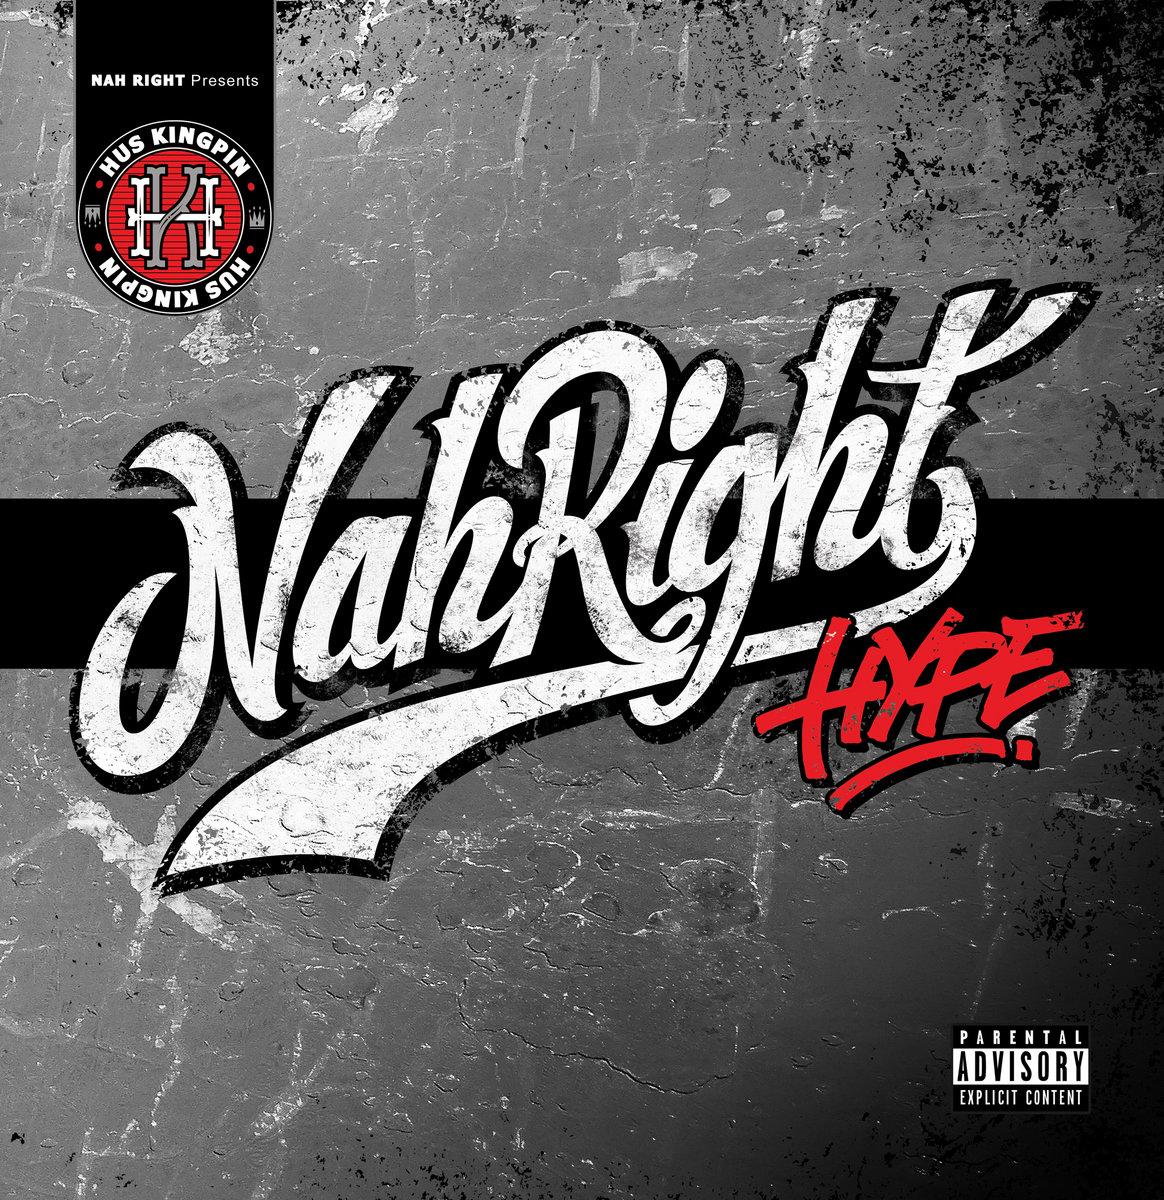 Hus Kingpin - Nah Right Hype | IteM Records/Taha Records